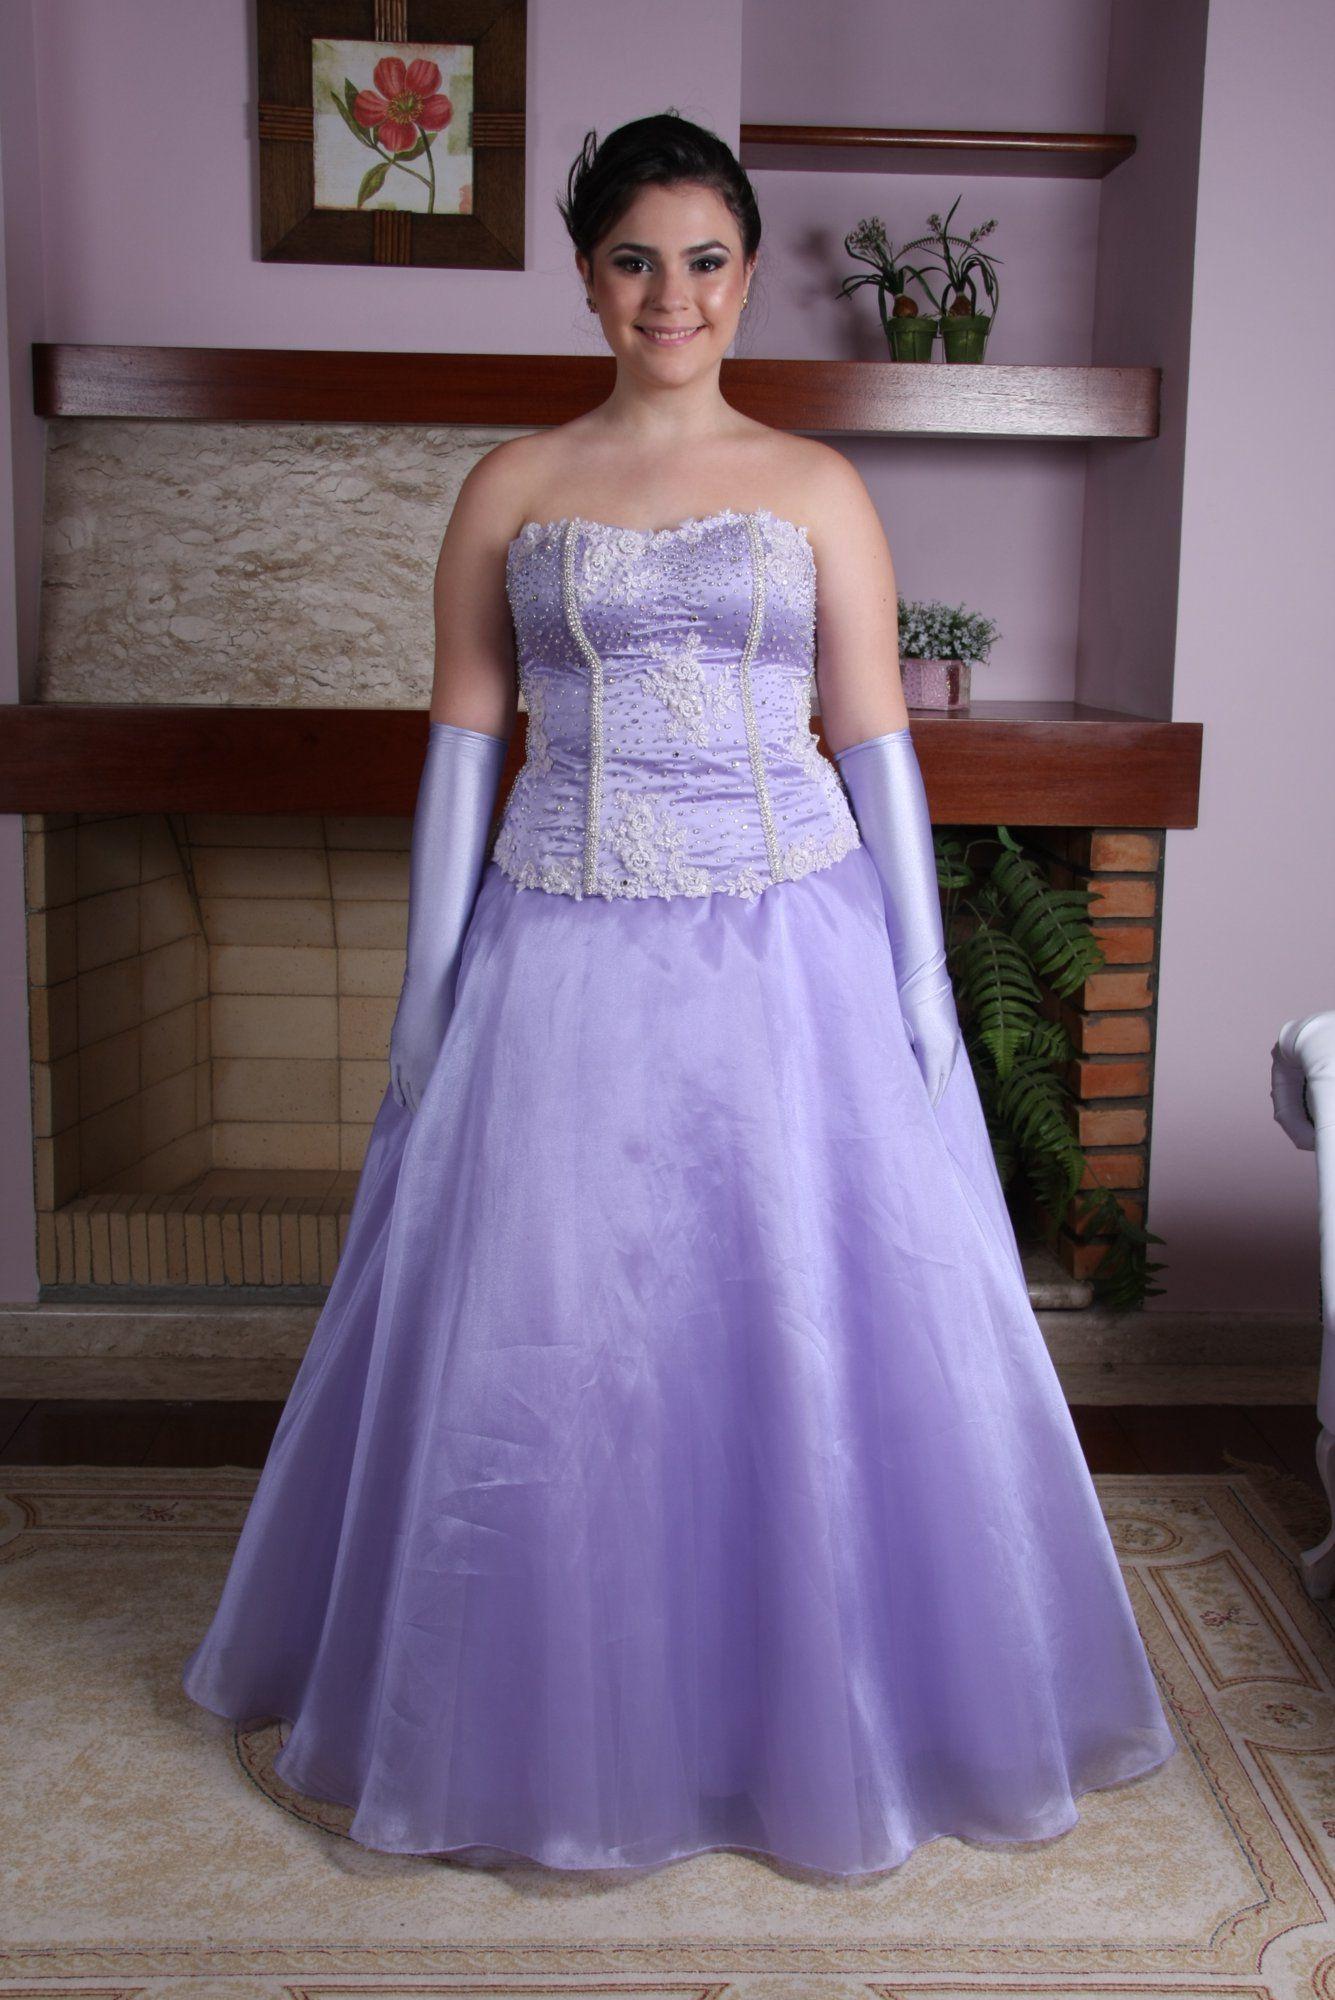 Vestido de Debutante Lilas - 8 - Hipnose Alta Costura e Spa para Noivas e Noivos - Campinas - SP Vestido de Debutante, Vestido de Debutante Lilas, Hipnose Alta Costura